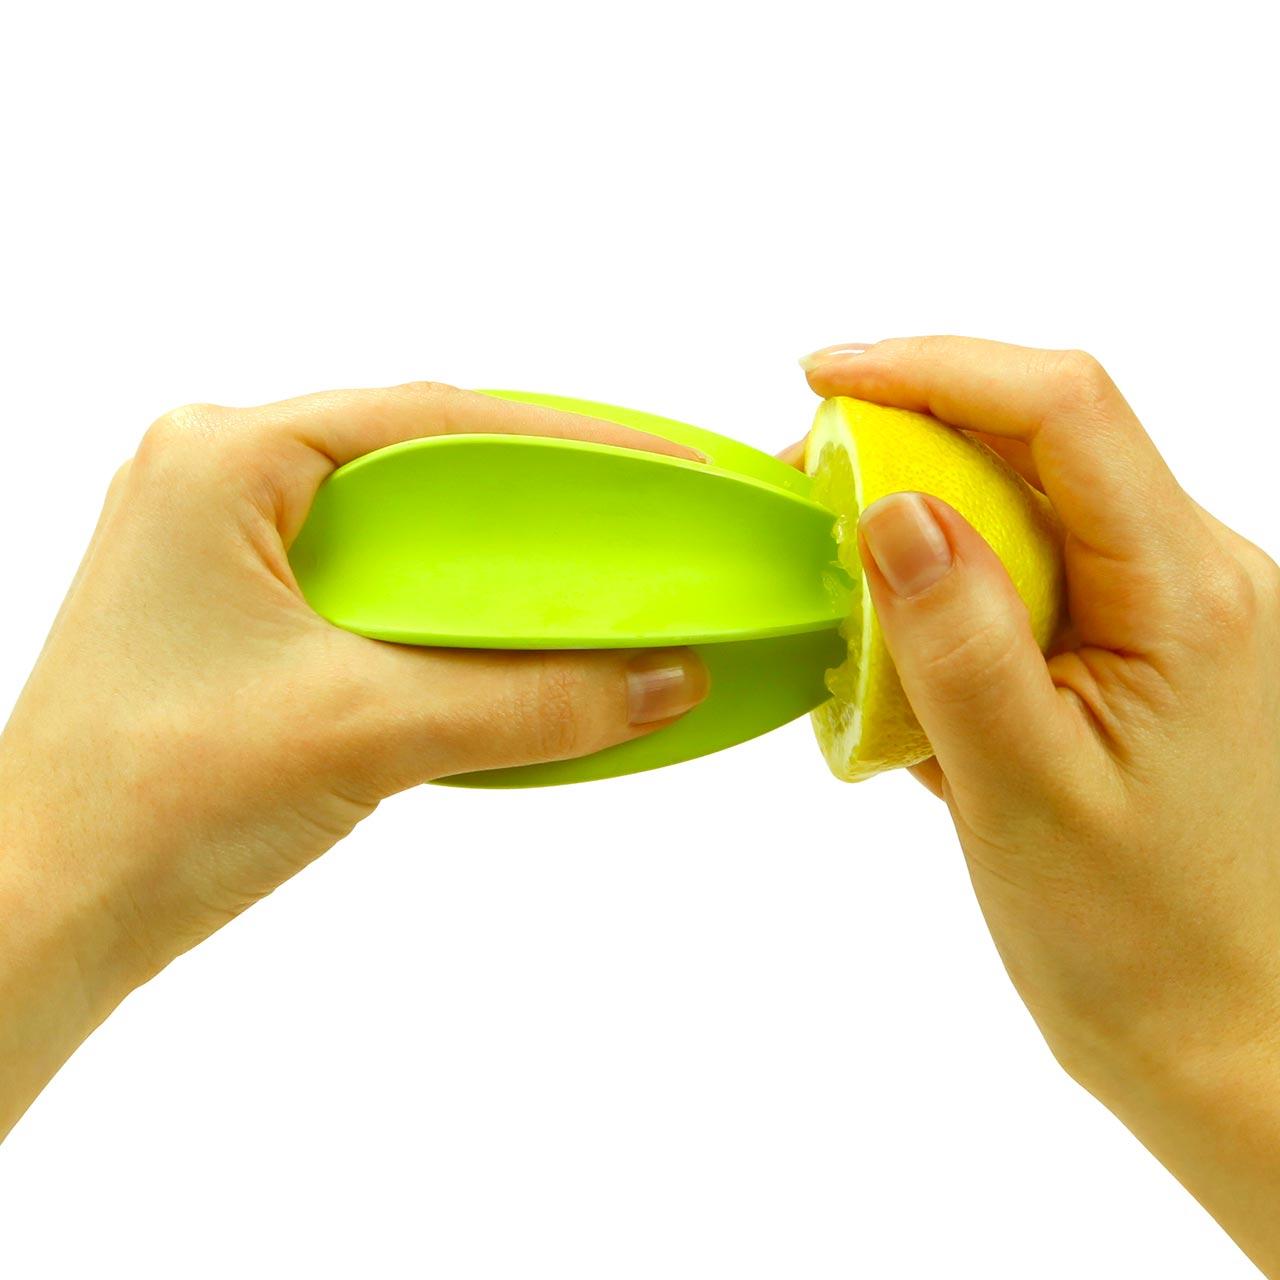 Lemon, Orange or Lime Juicer 'Diego'  Green by COOKUT | The Design Gift Shop